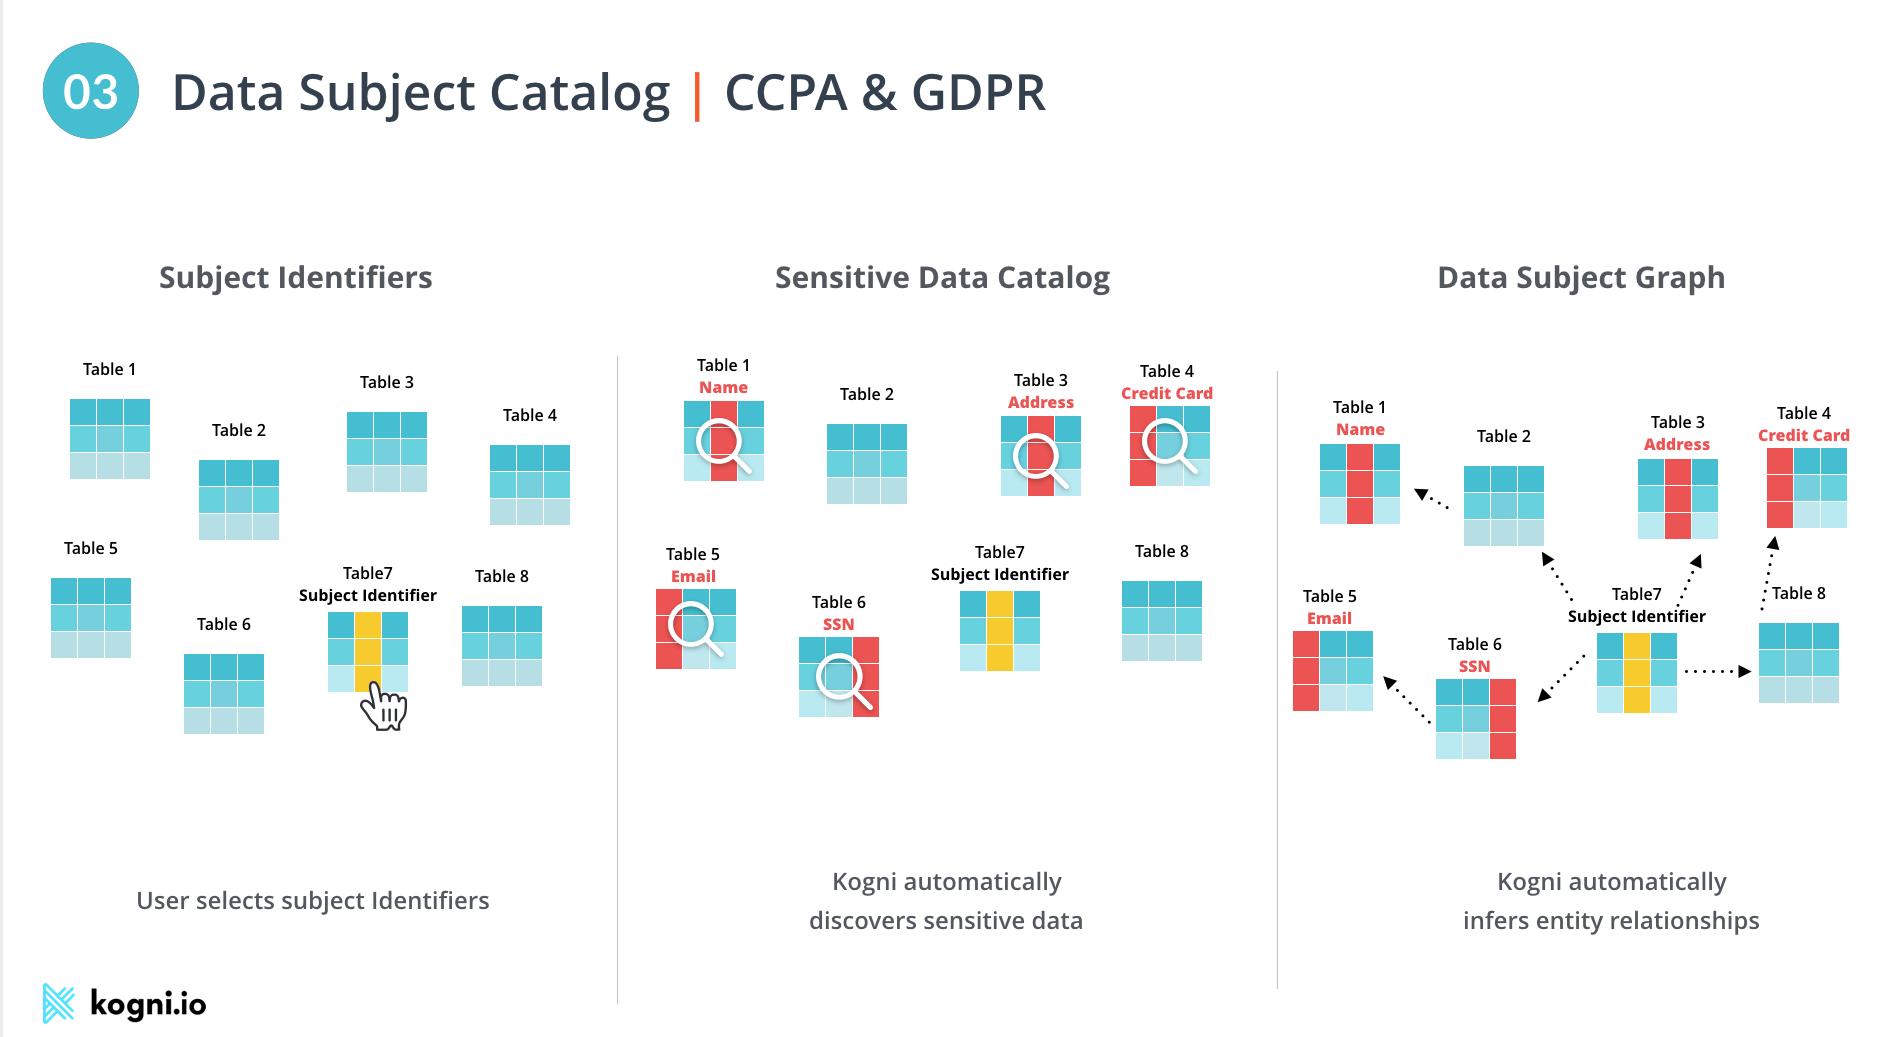 Data Subject Catalog- CCPA